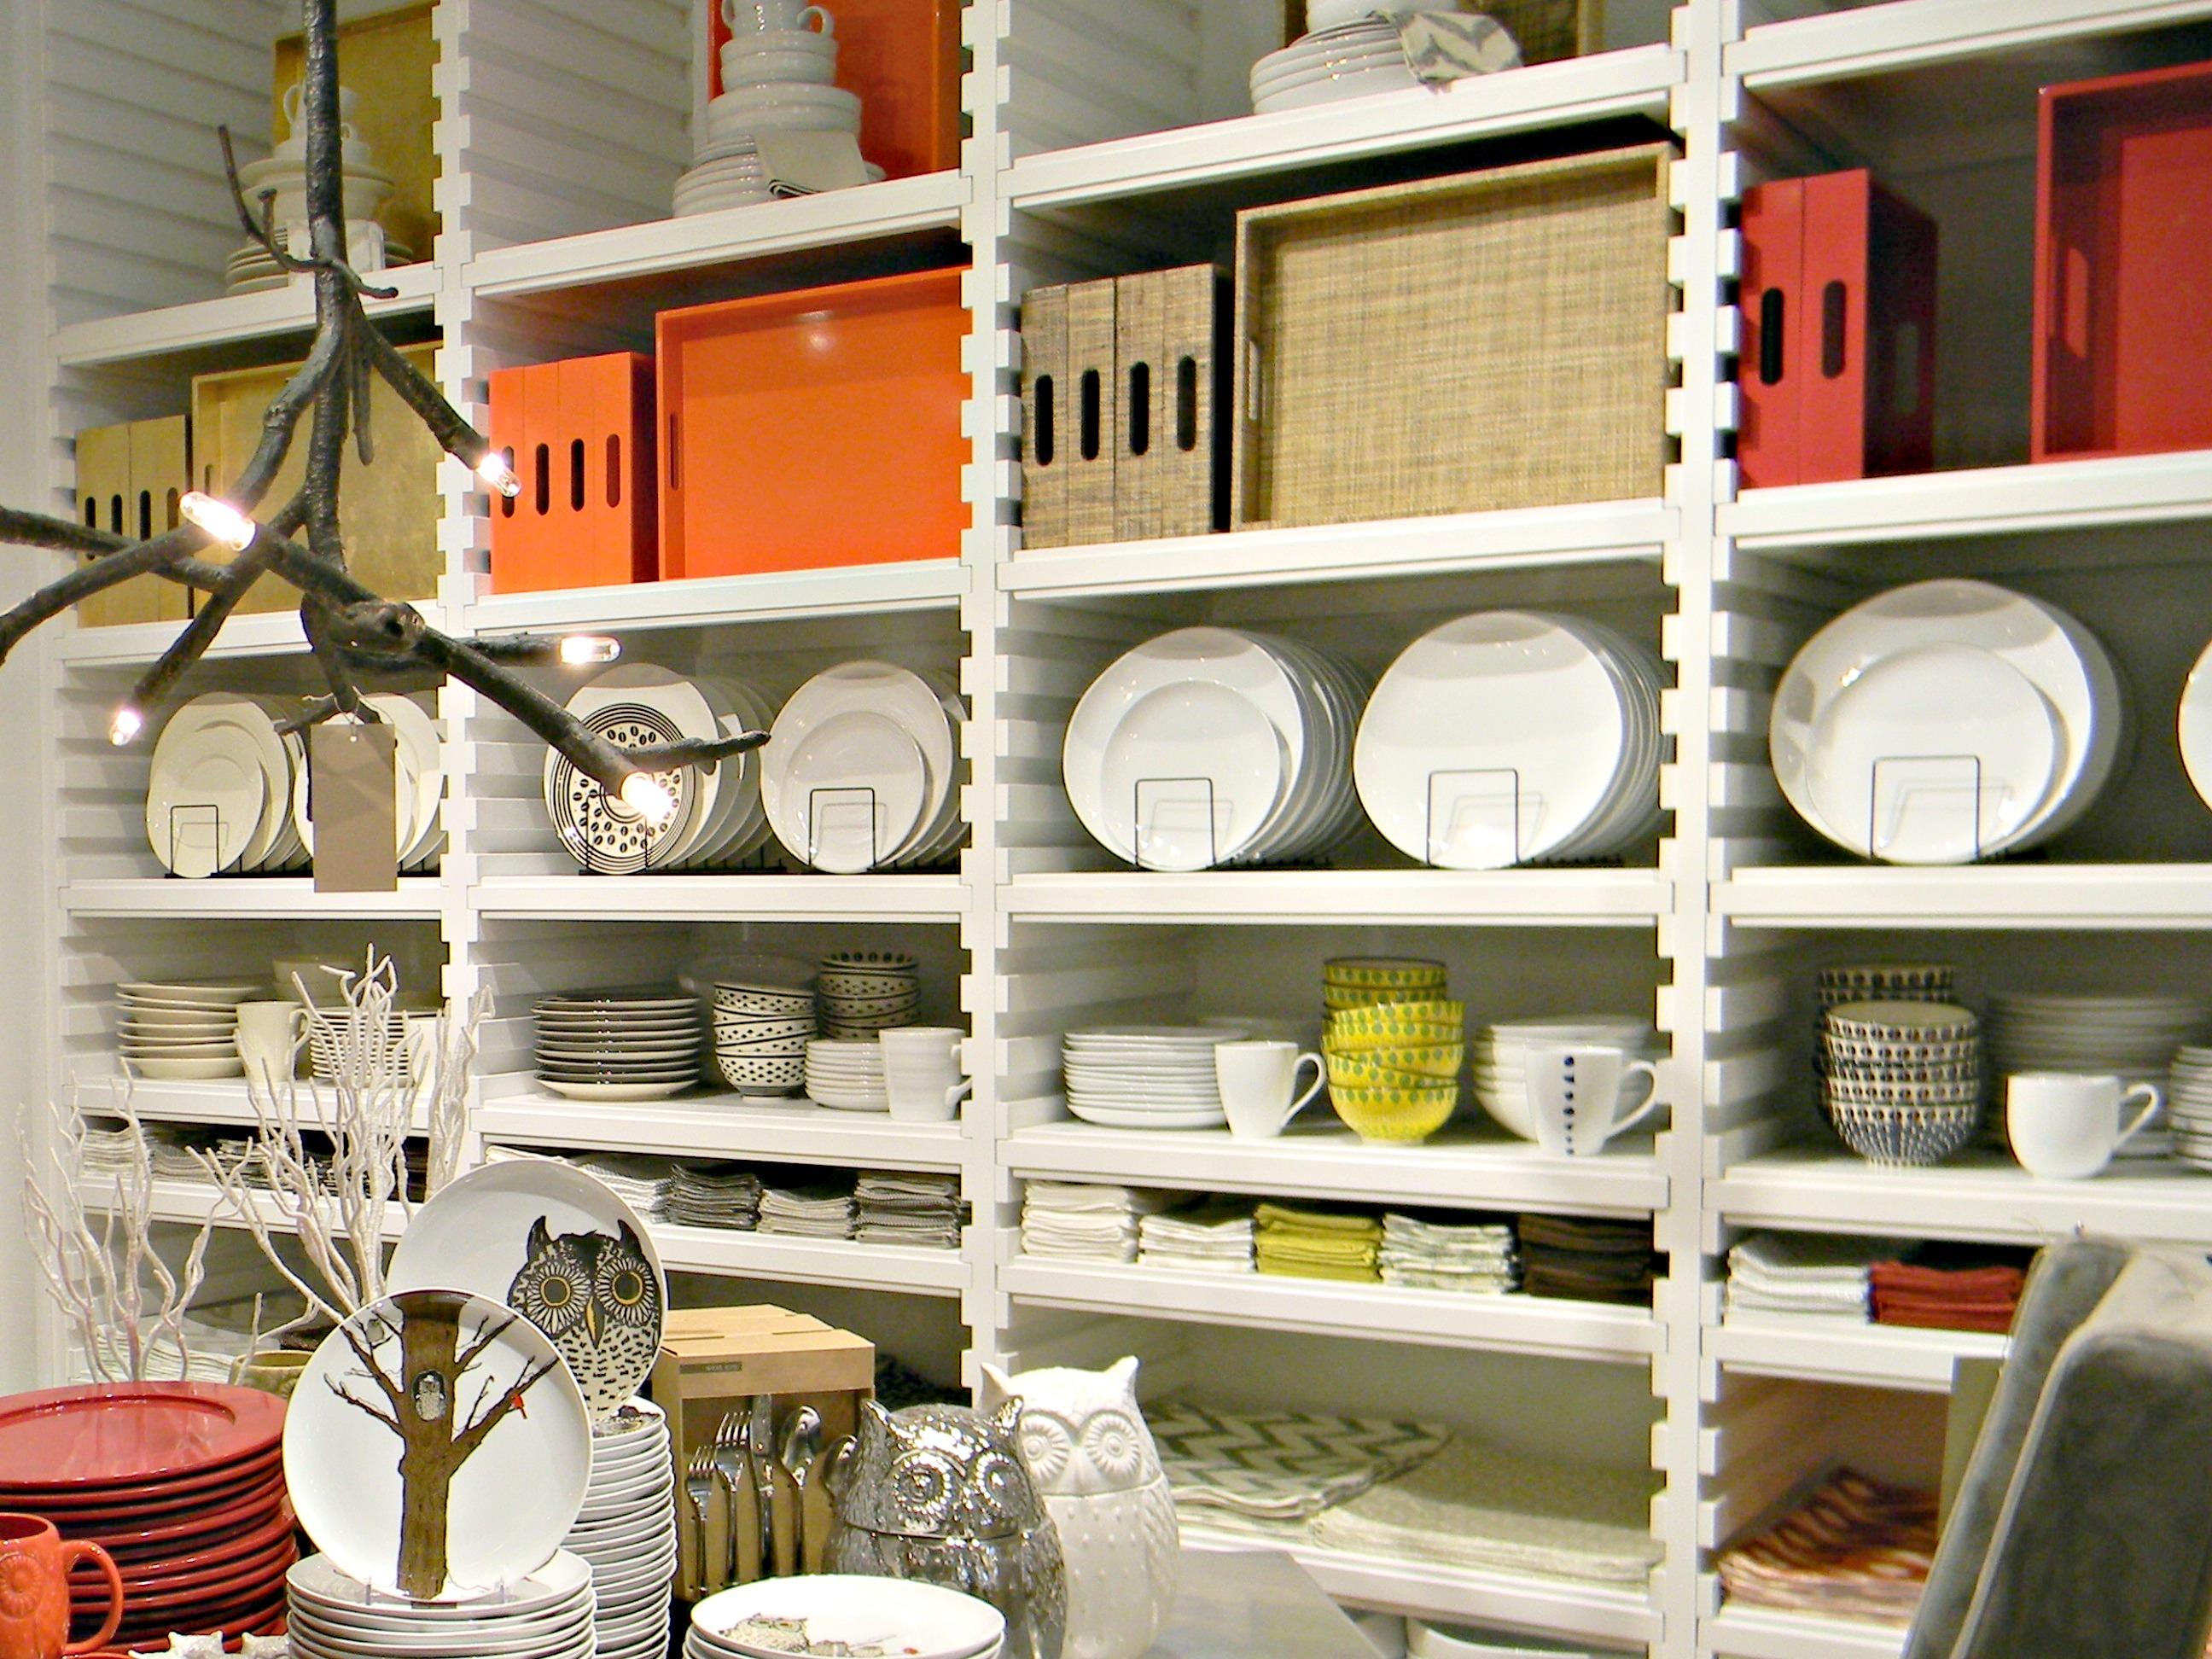 Amazing Furniture Stores Like West Elm #5: West Elm ...